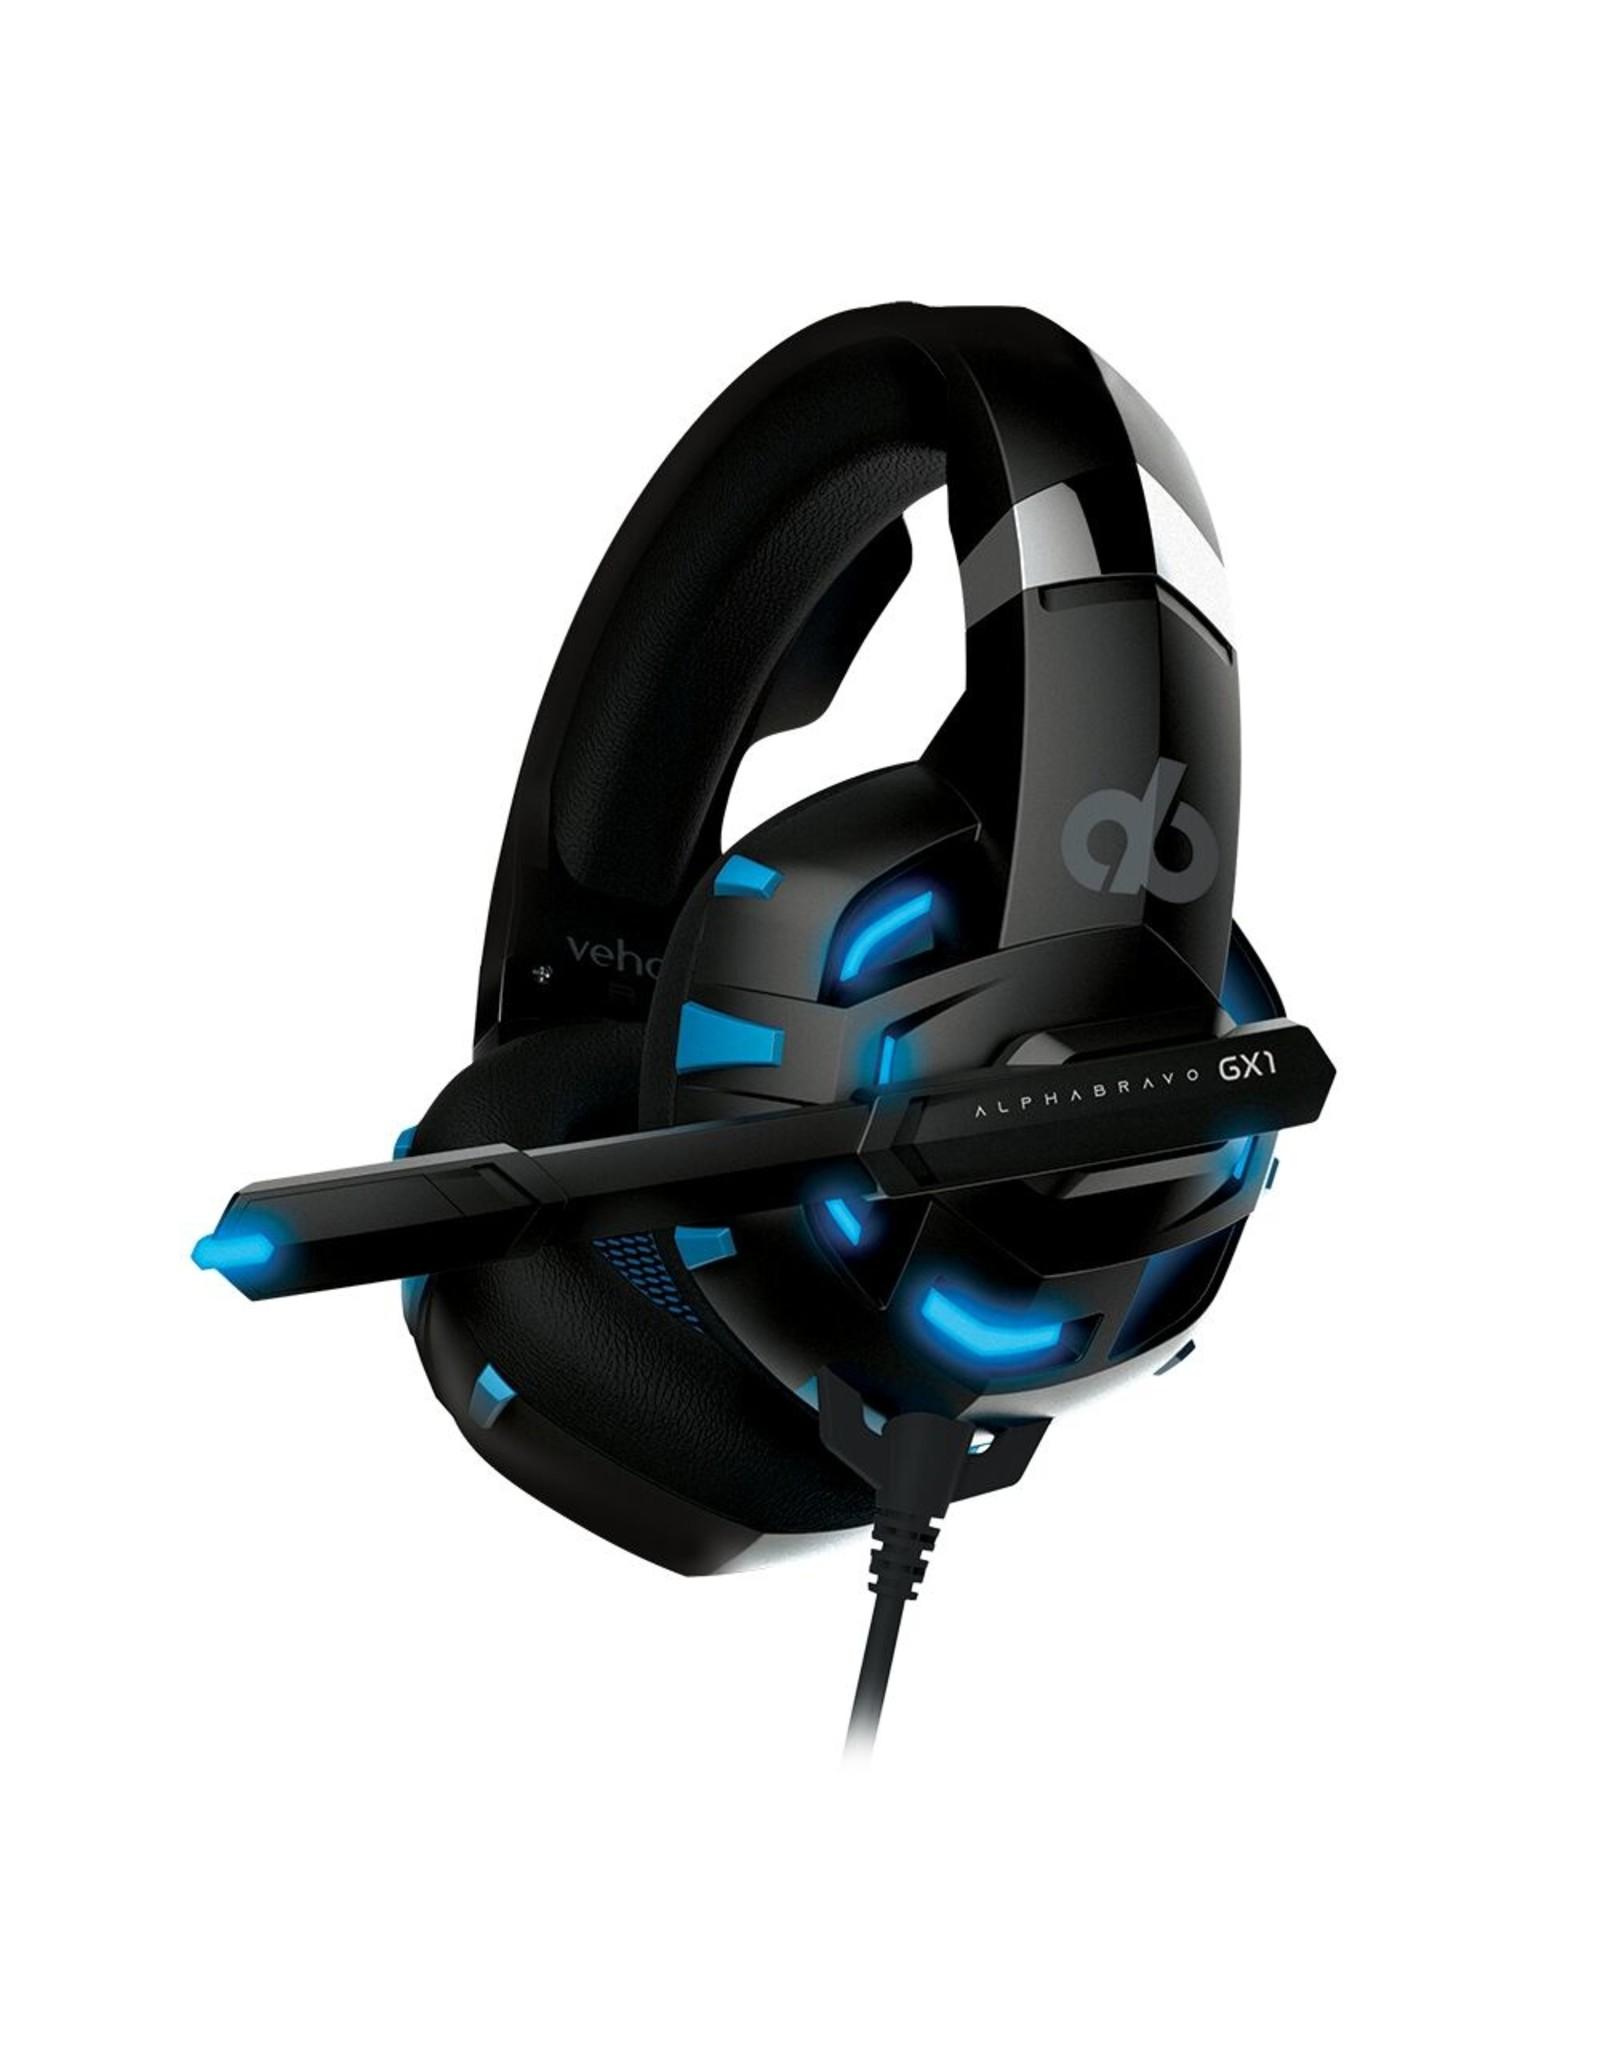 Veho Veho Alpha Bravo GX-1 Gaming Headset